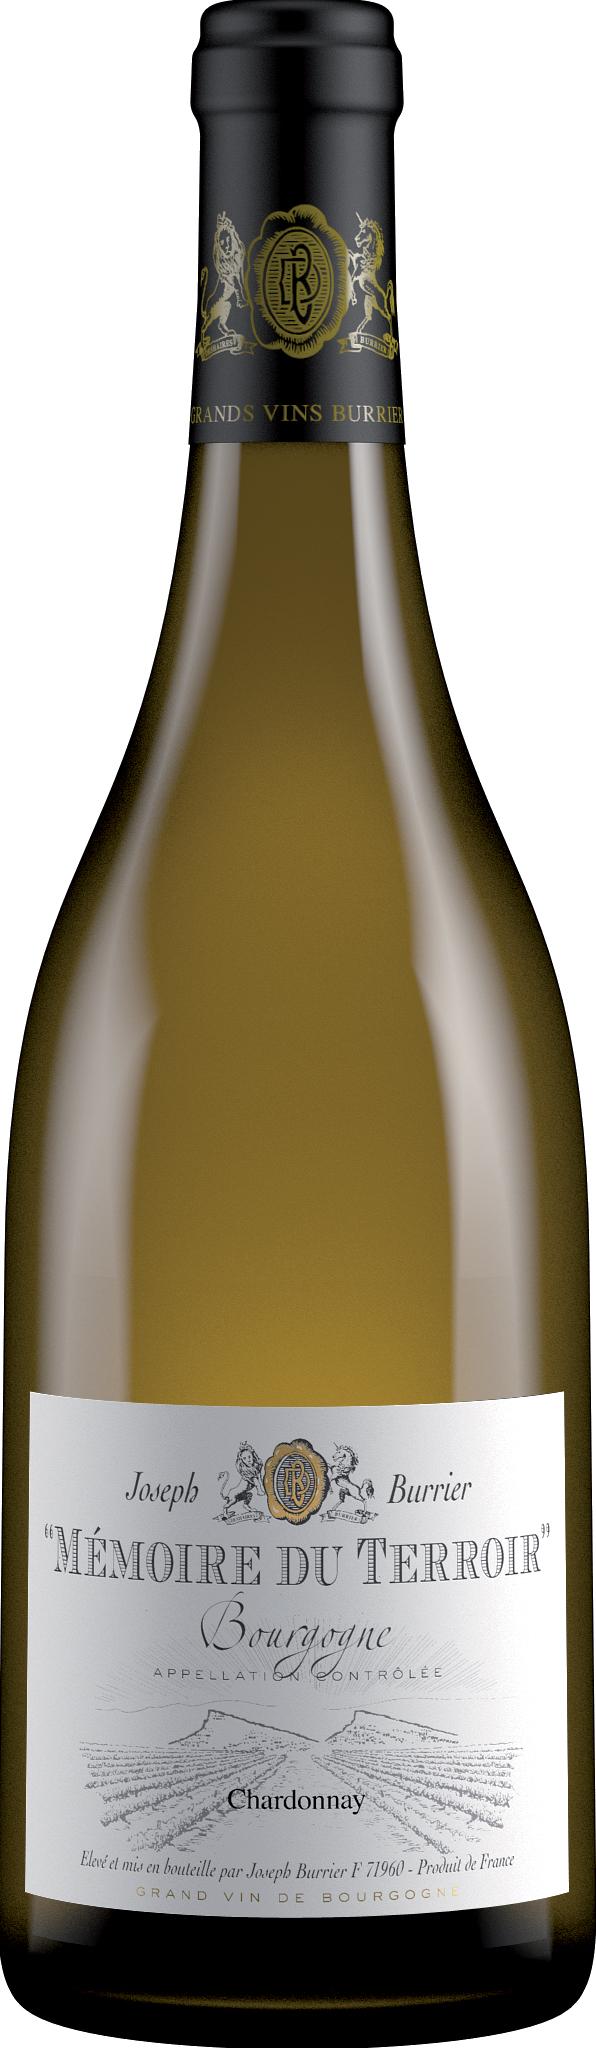 Вина Бургундии (Bourgogne) - бургундские вина